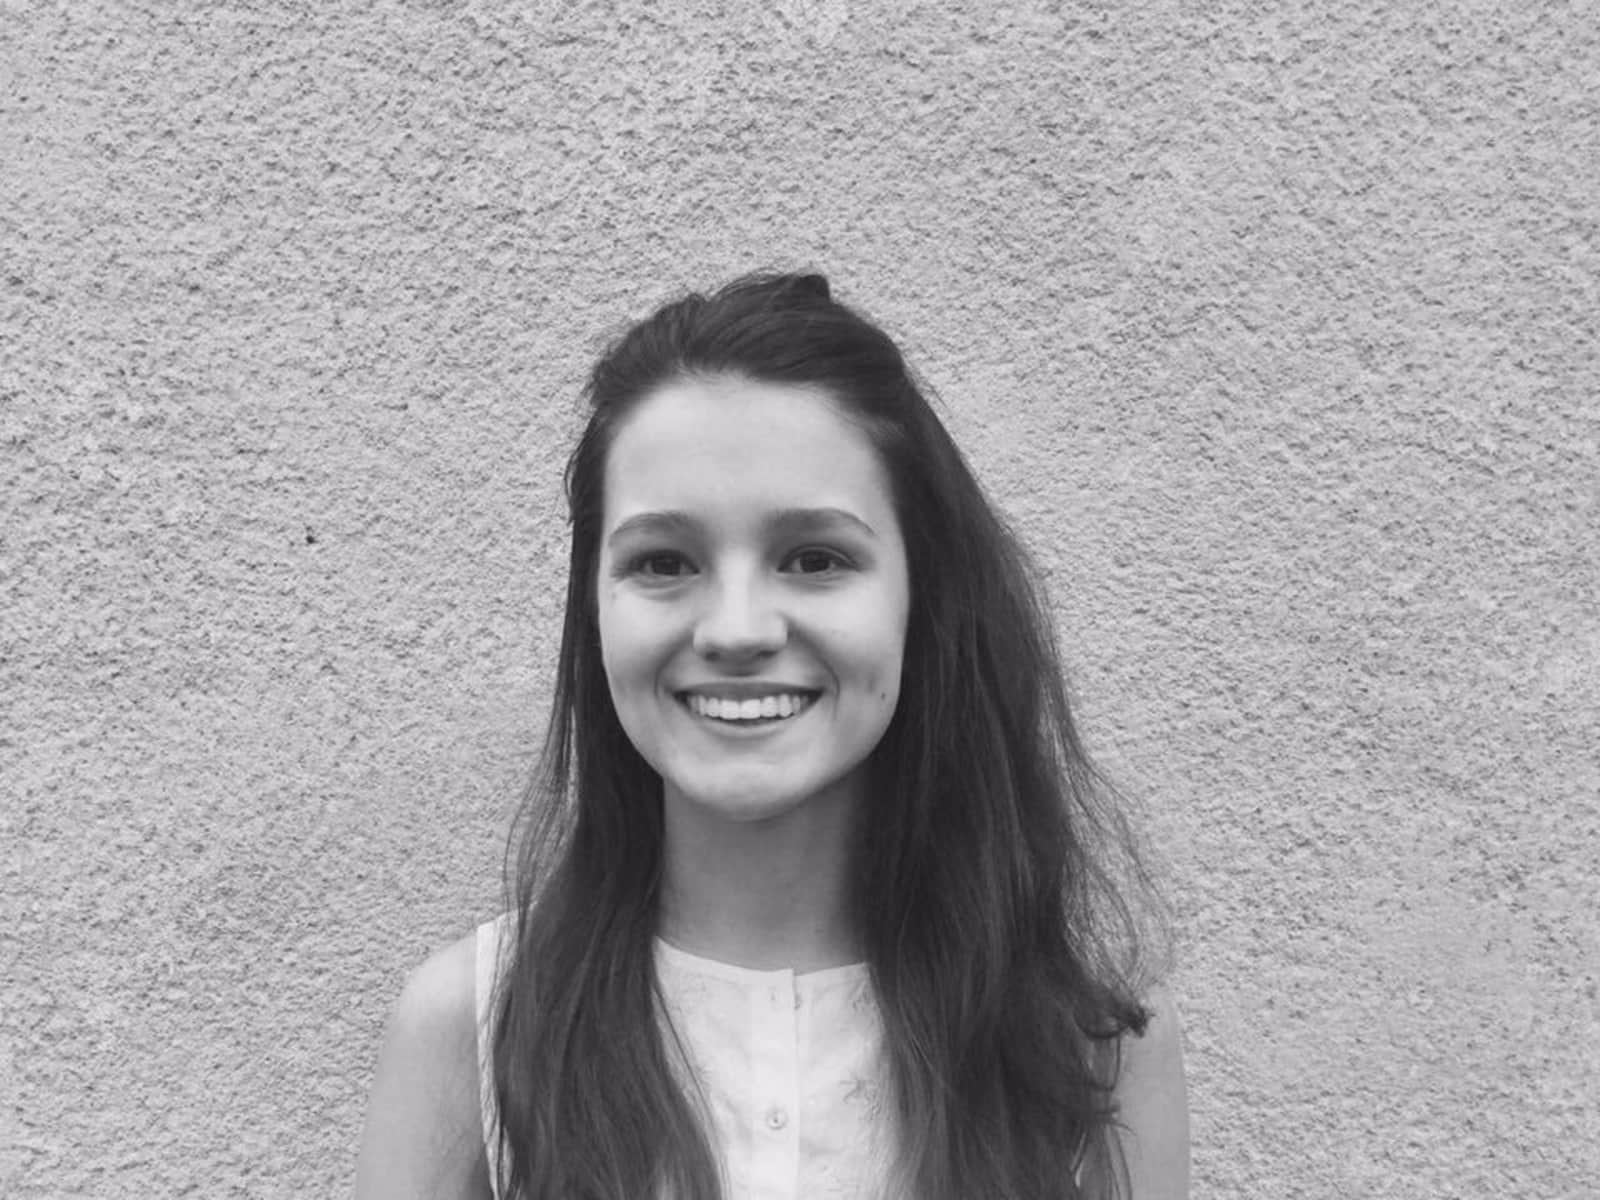 Lena from Bristol, United Kingdom